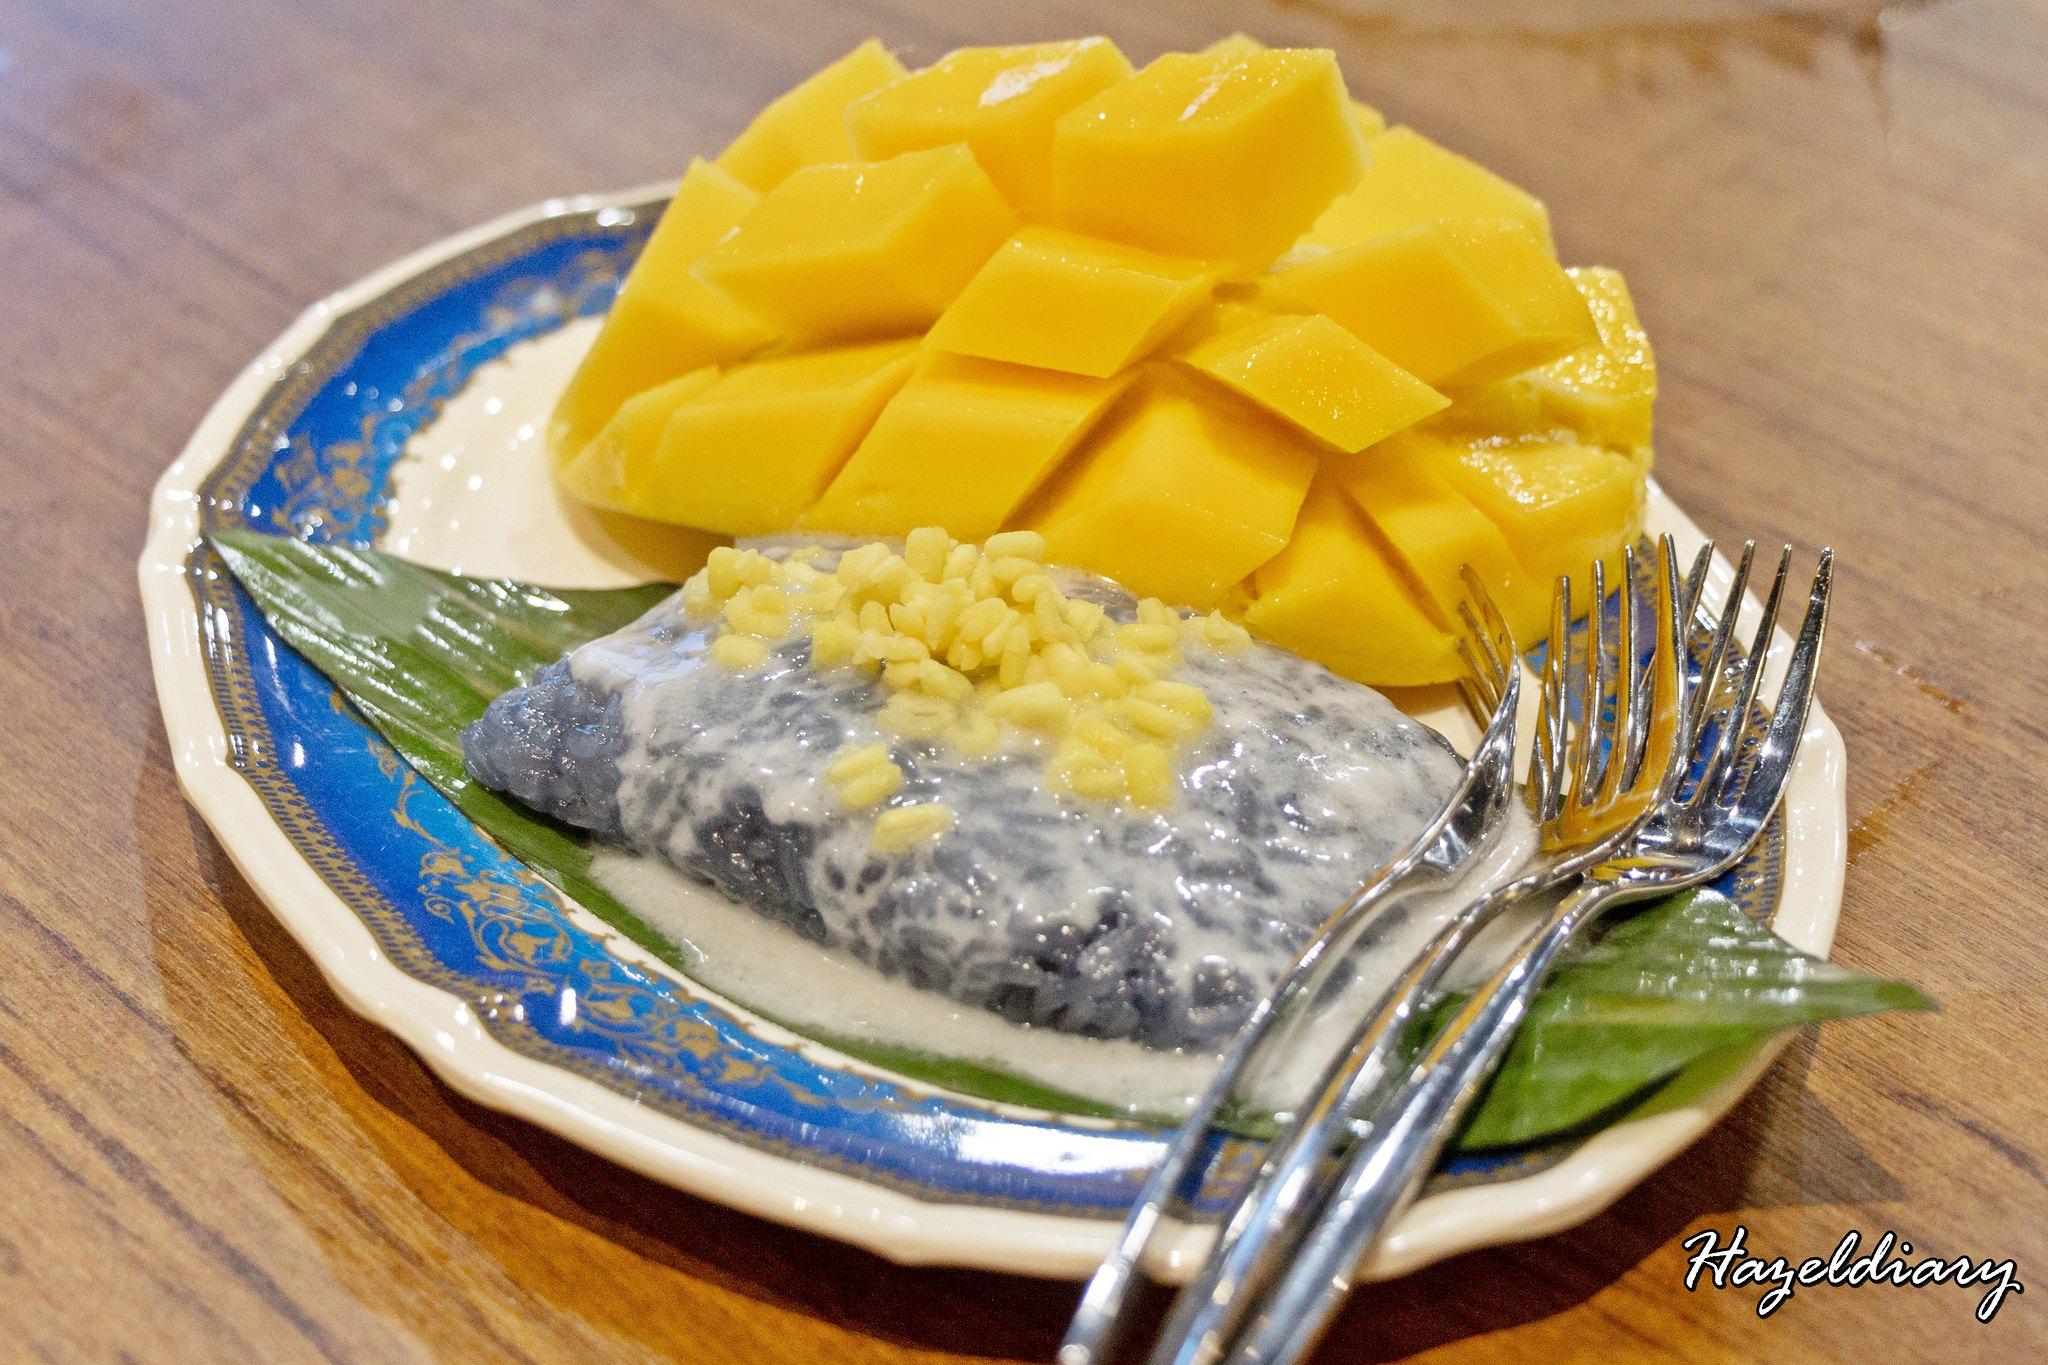 Soi Thai Soi Nice JEM-Hazeldiary-Mango Sticky Rice